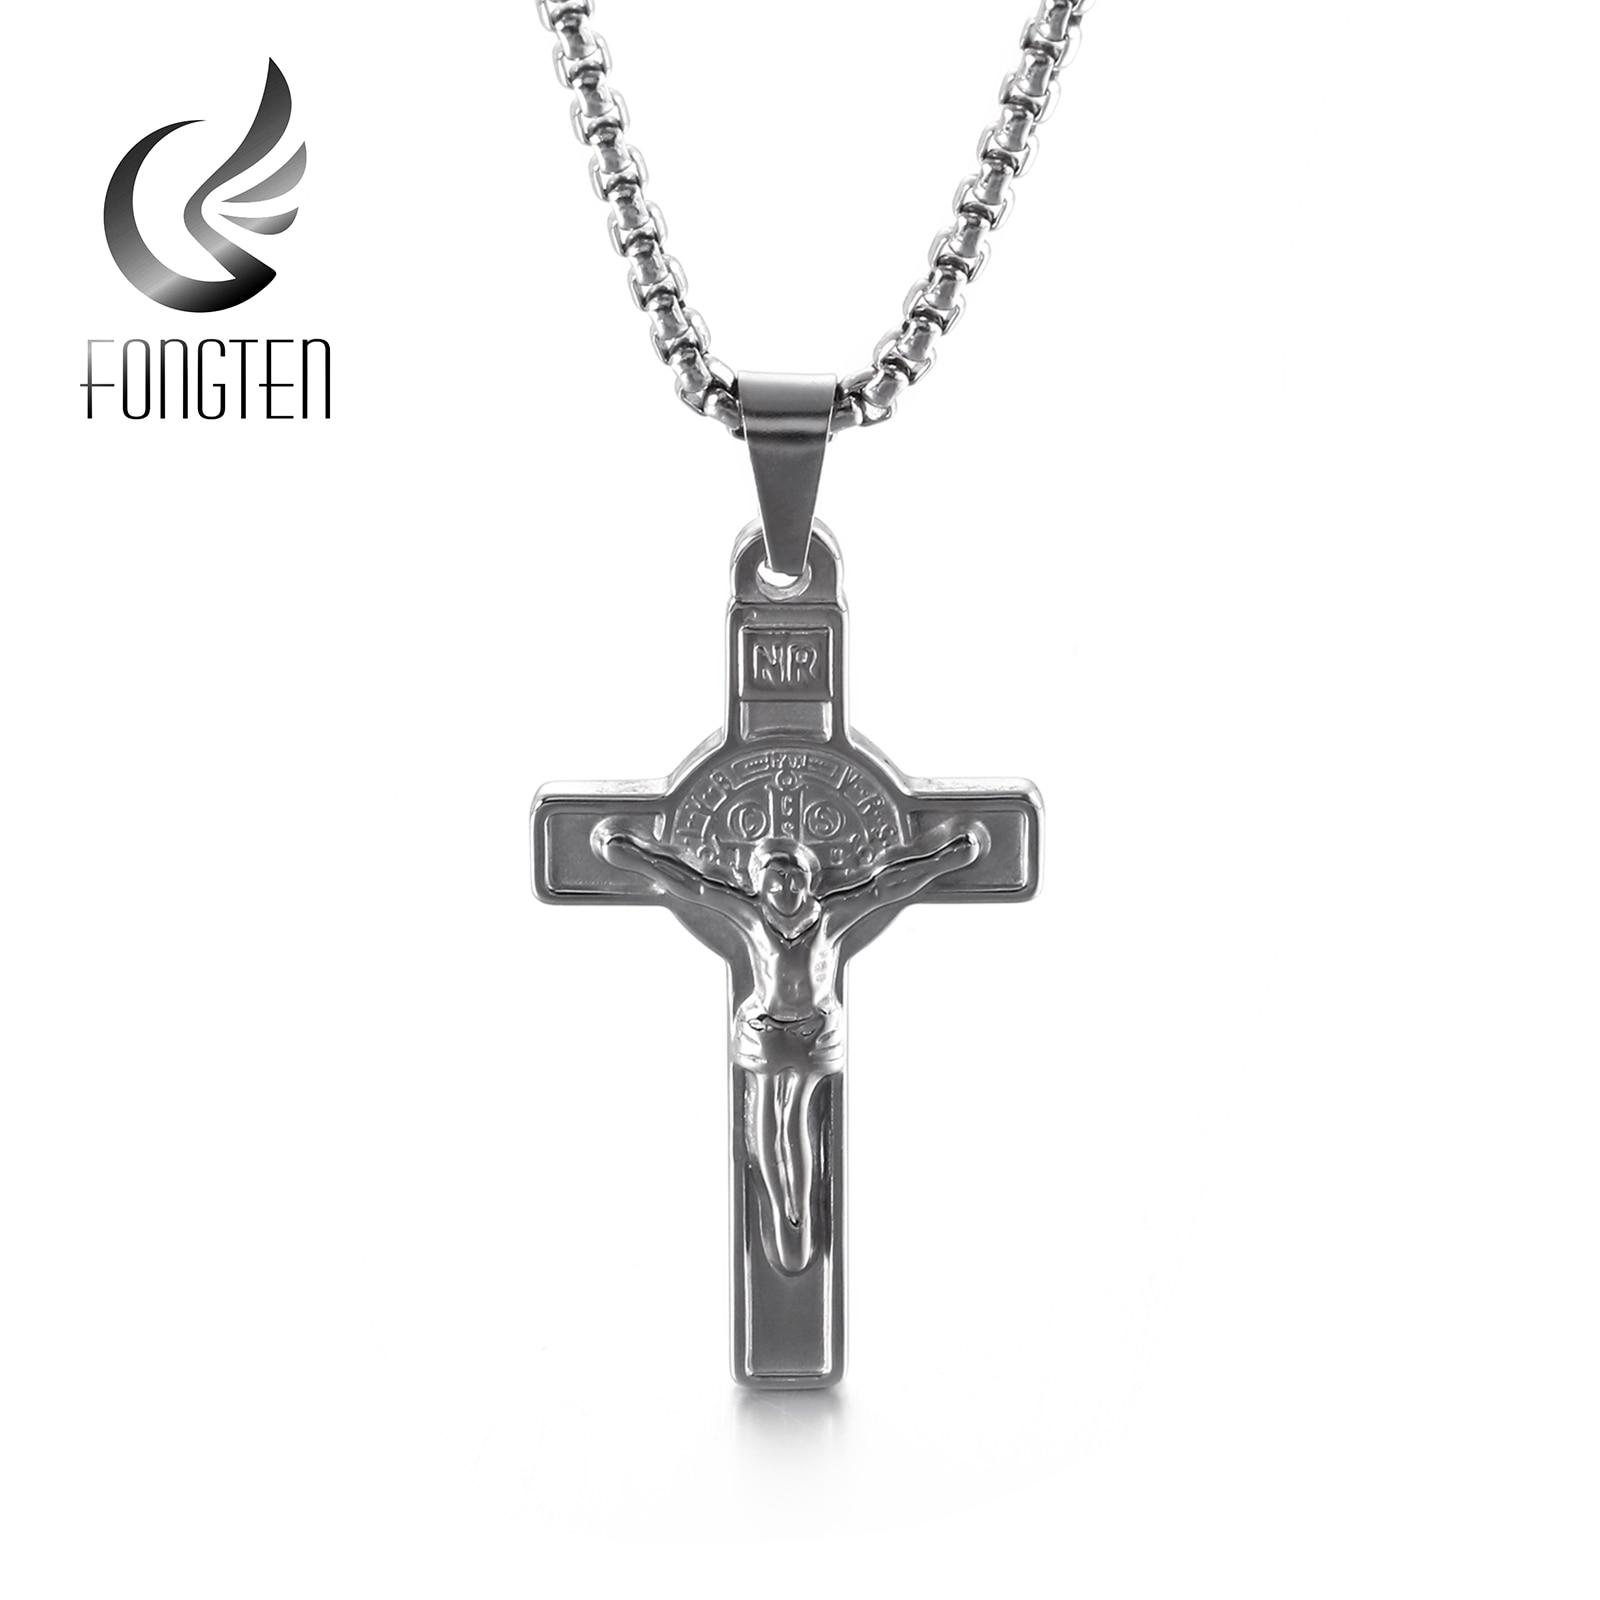 Fongten Hip Hop Cross Pendant Necklace Stainless Steel Jewelry for Men Punk Jesus Chains Necklaces